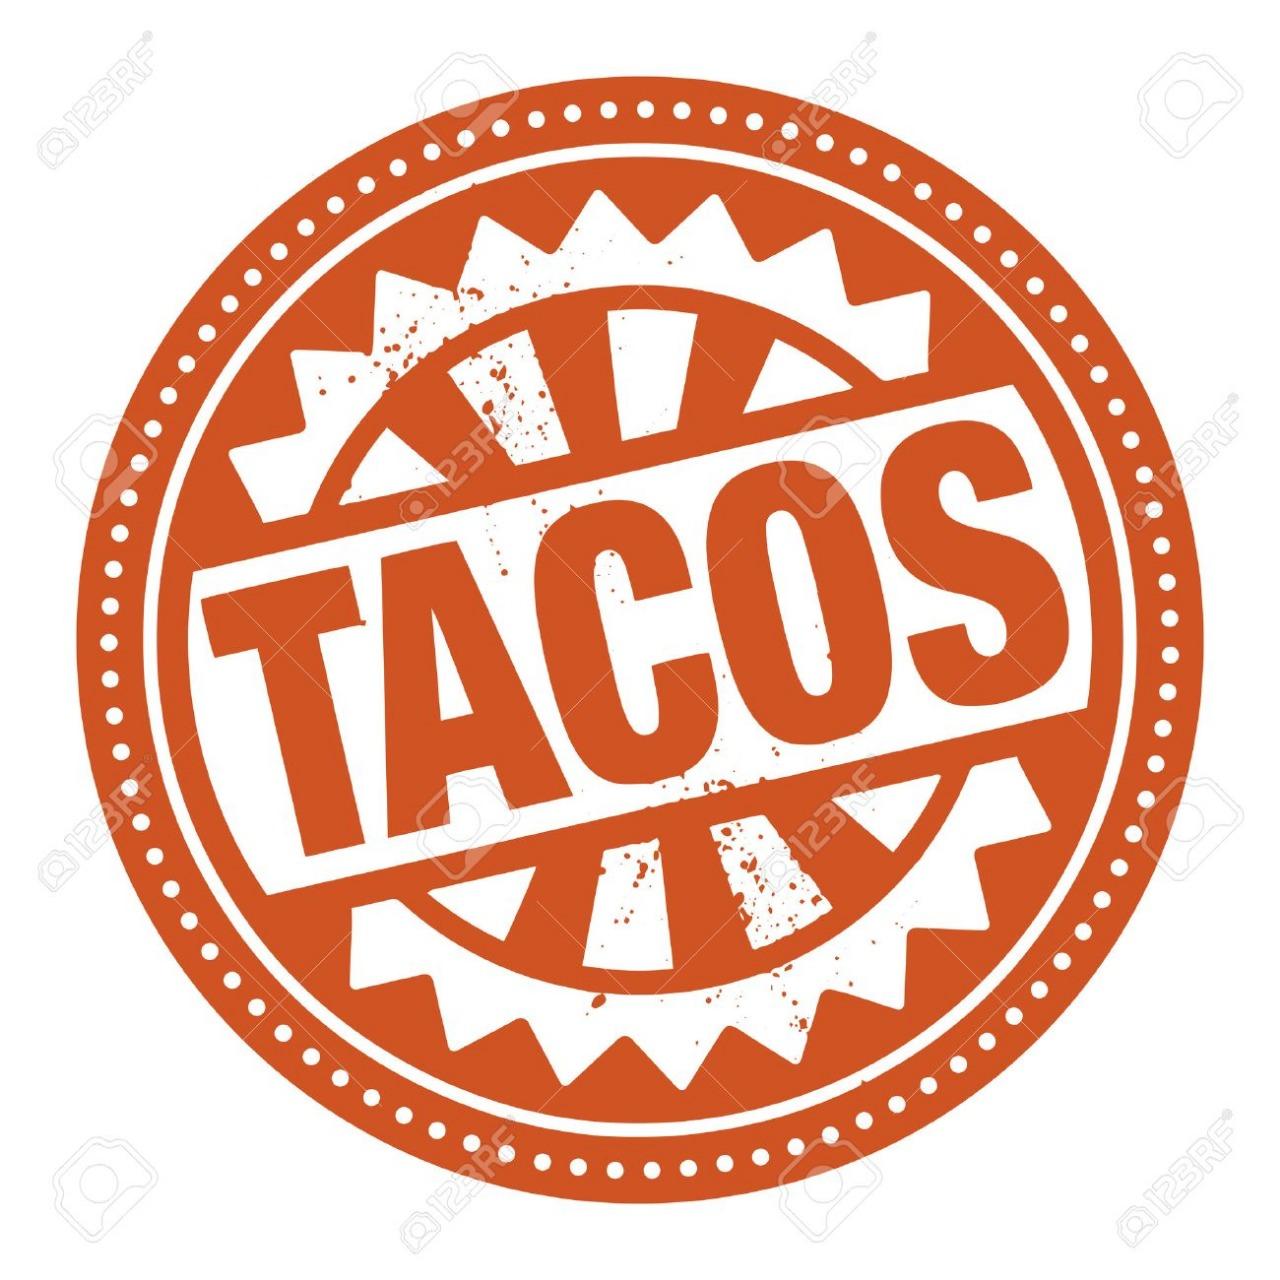 cheque cadhoc Tacos , cheque cadeau pour entreprise, cheque cadeau pour sa femme, cadeau pour homme, cadeau pour maman